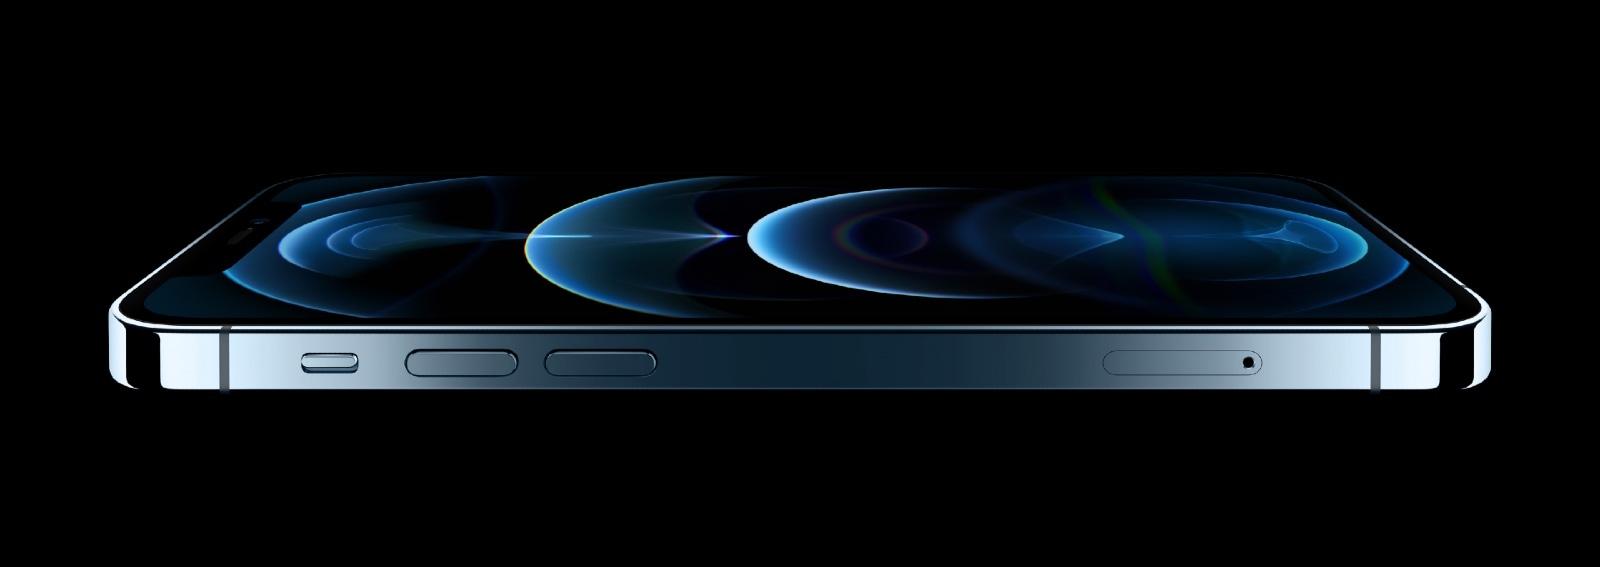 Apple_iphone12pro